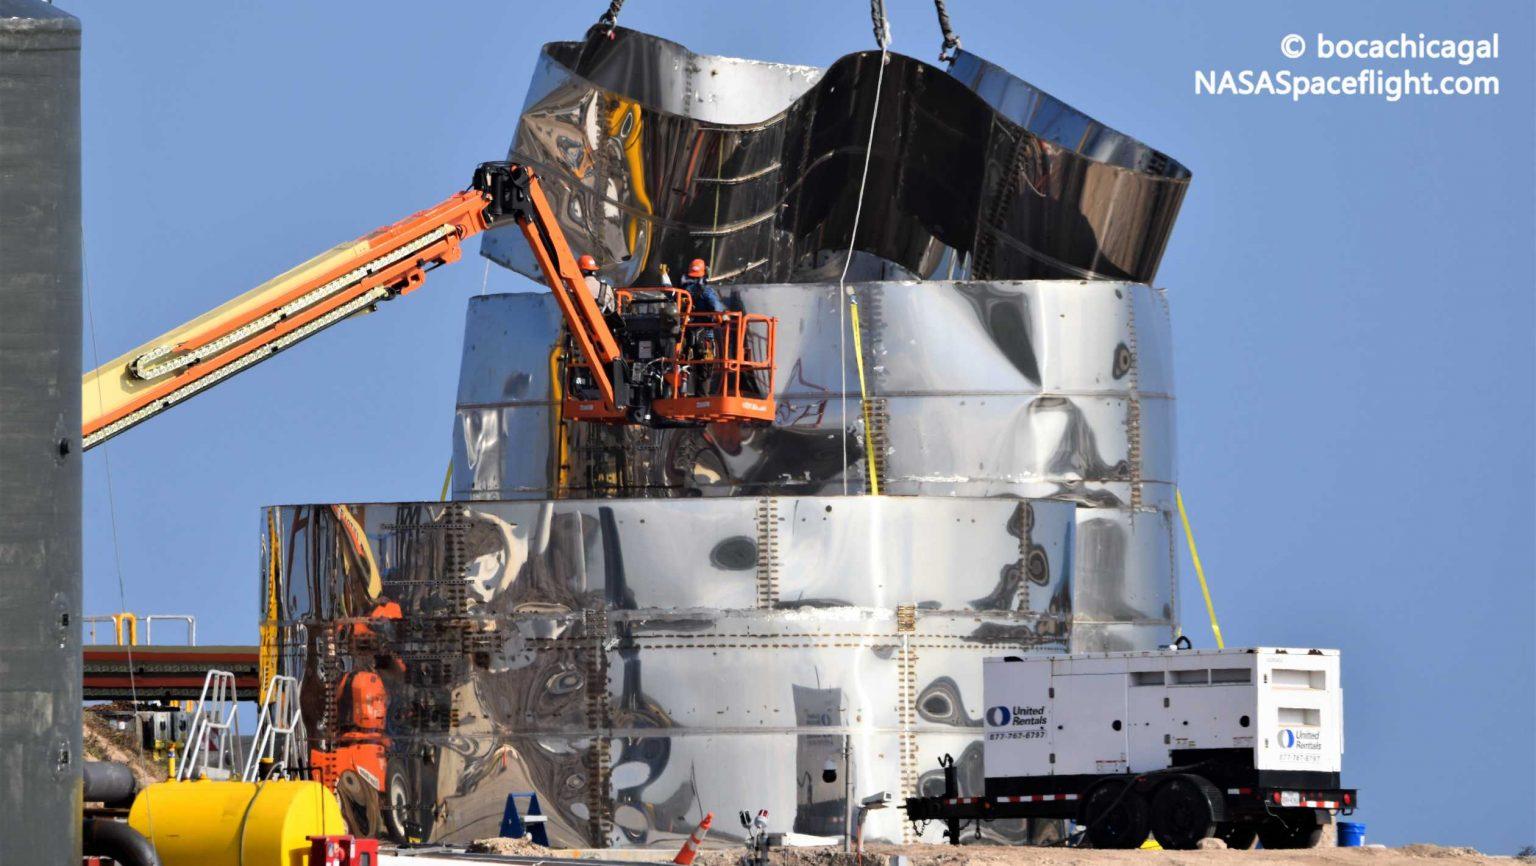 https://www.teslarati.com/wp-content/uploads/2019/12/Starship-Mk1-120819-NASASpaceflight-bocachicagal-disassembly-3-crop-c-1536x866.jpg